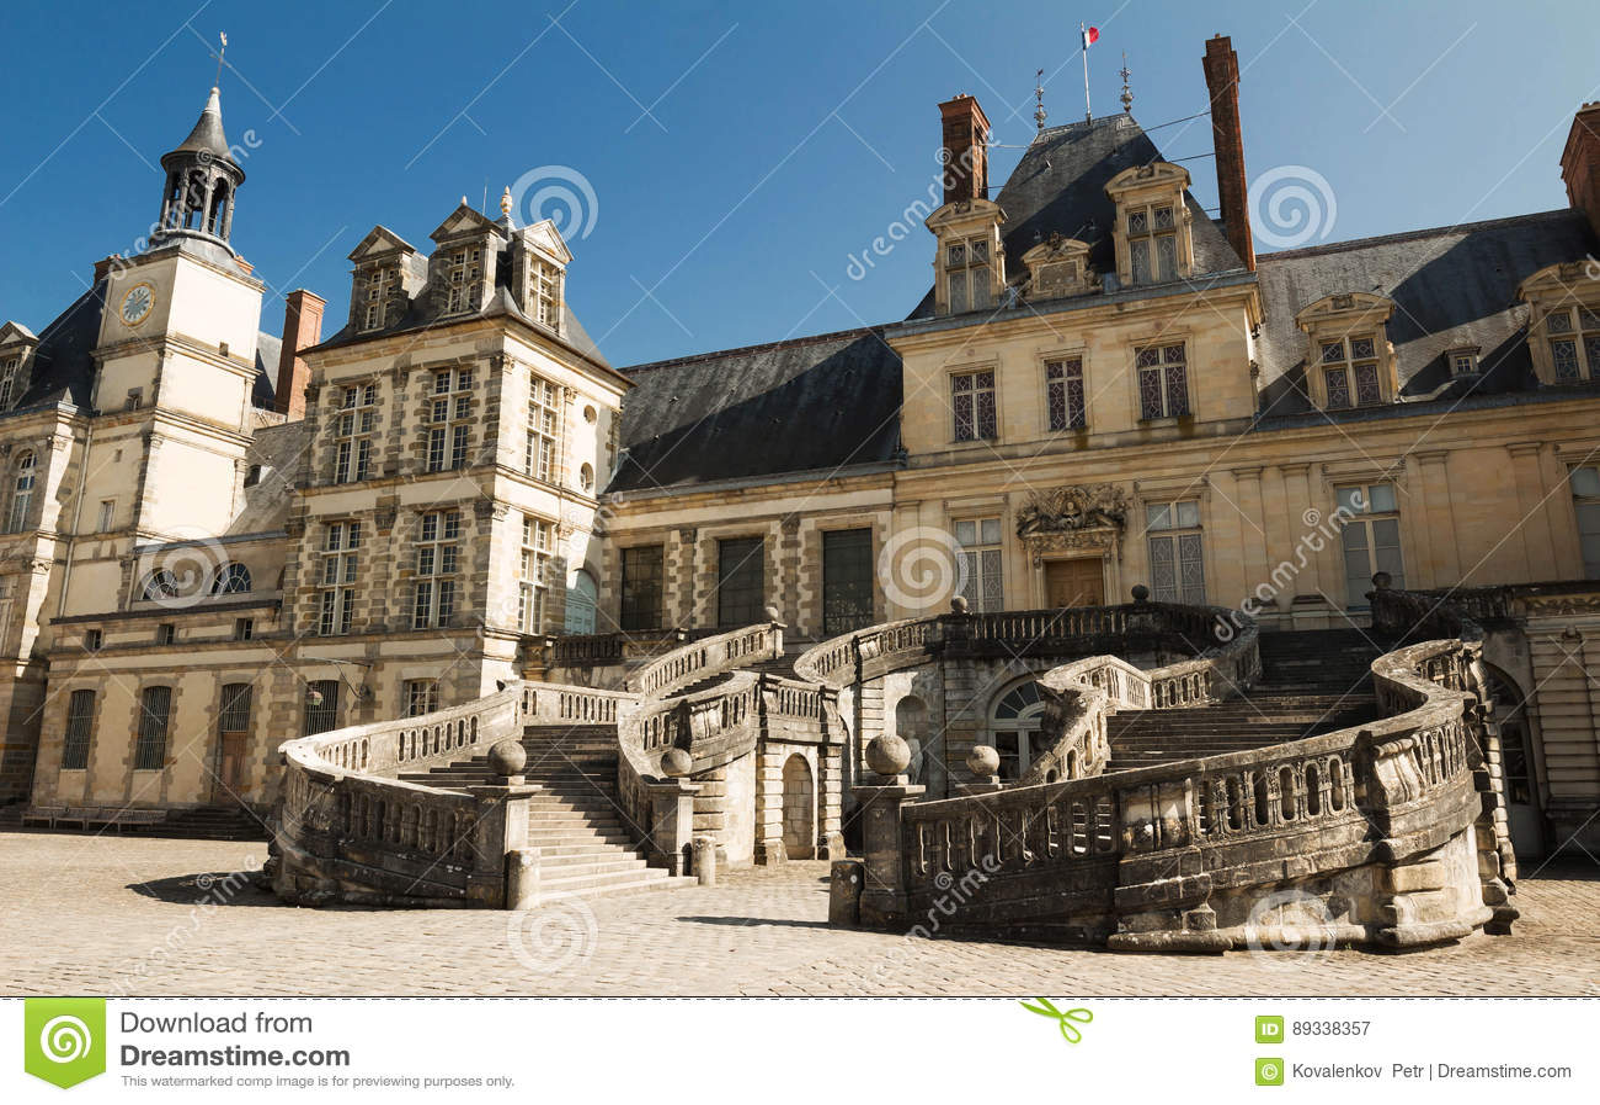 Замок de Фонтенбло, Франция